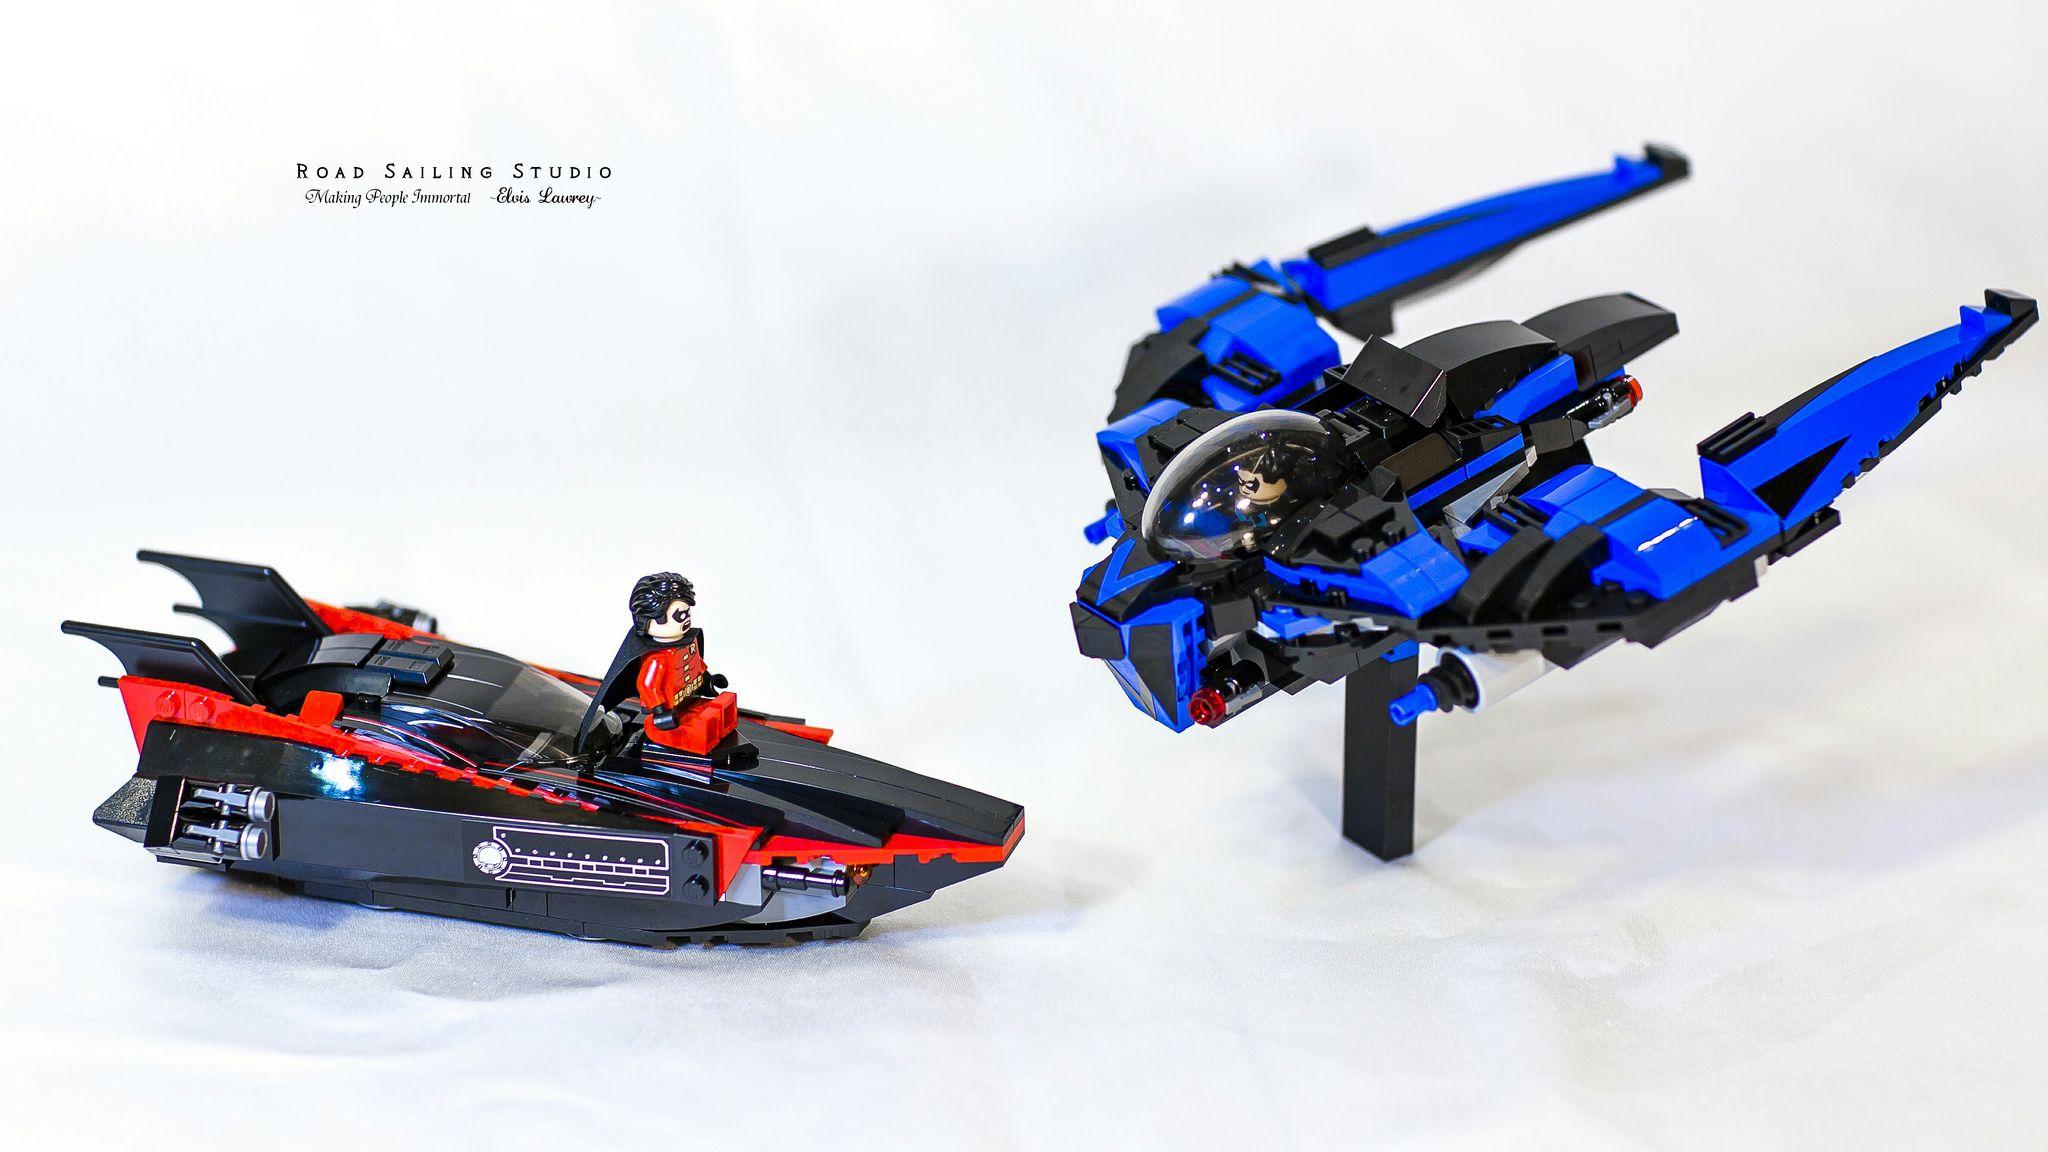 Lego Batman MOC Nightwing submarine (76079) | Pinterest ...